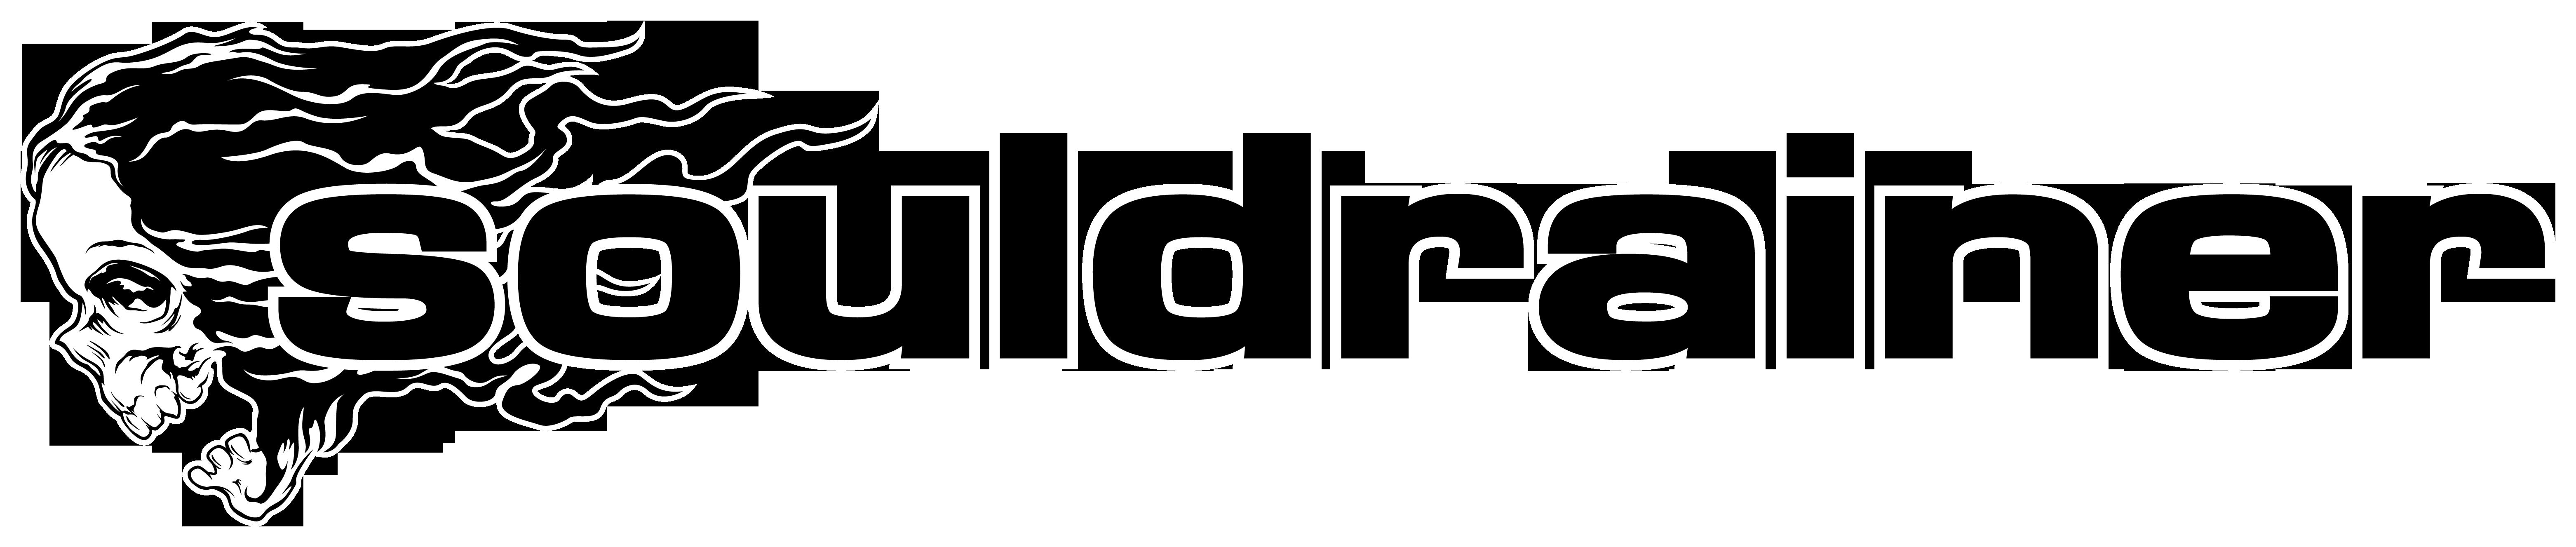 Souldrainer_Skull_Logo_Transparent